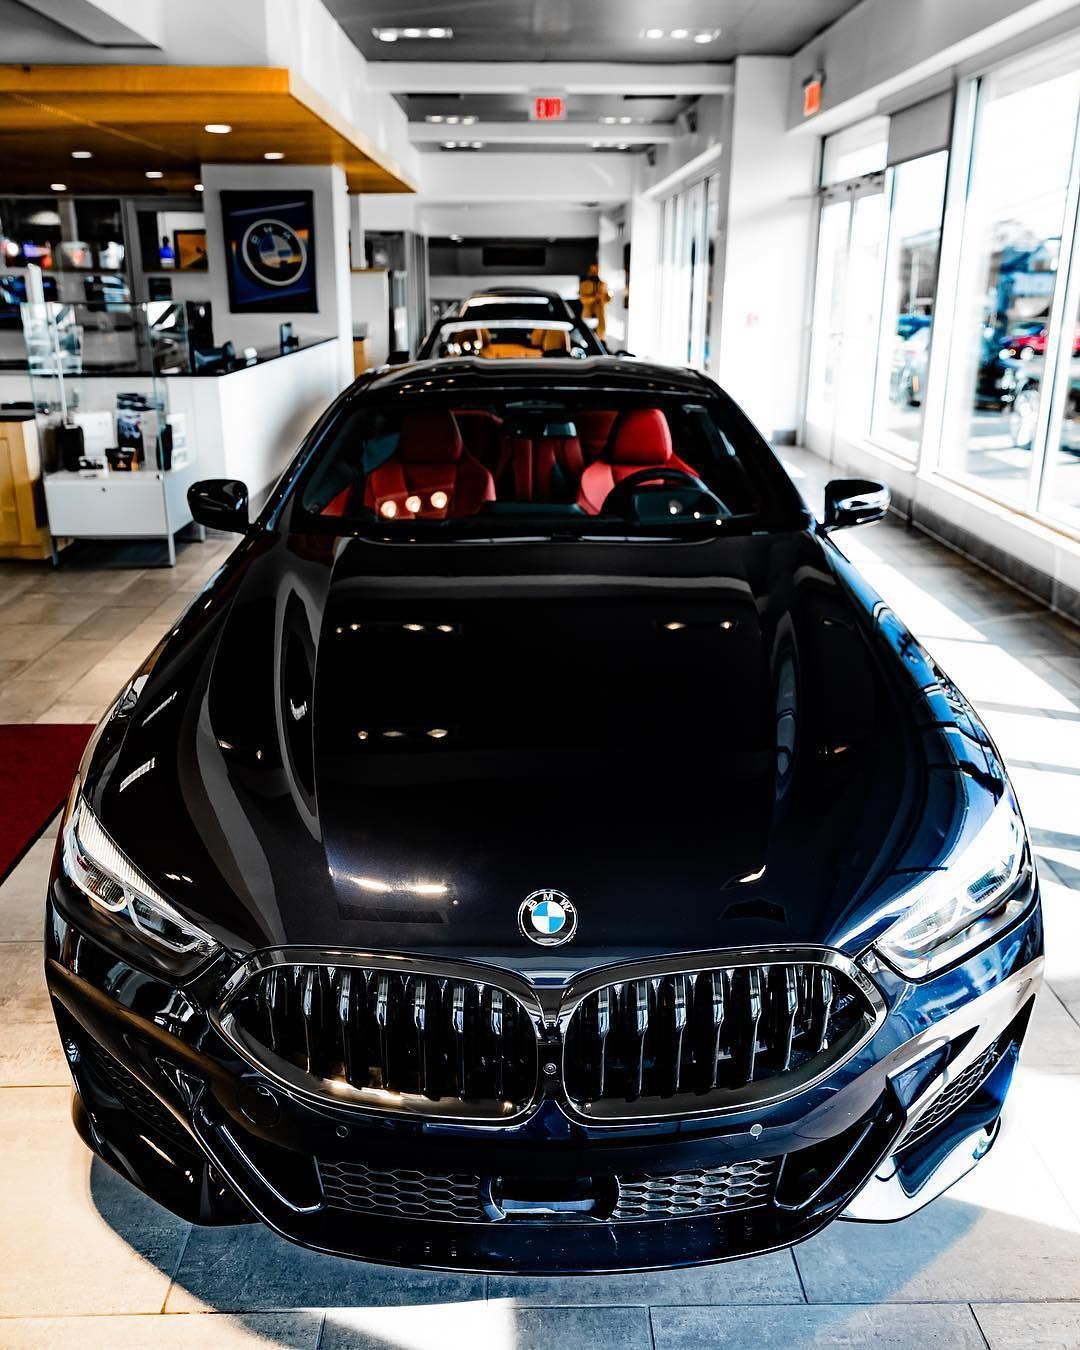 The All New M850i Sapphire Black V8 Twinpower Turbo 530 Hp Torque